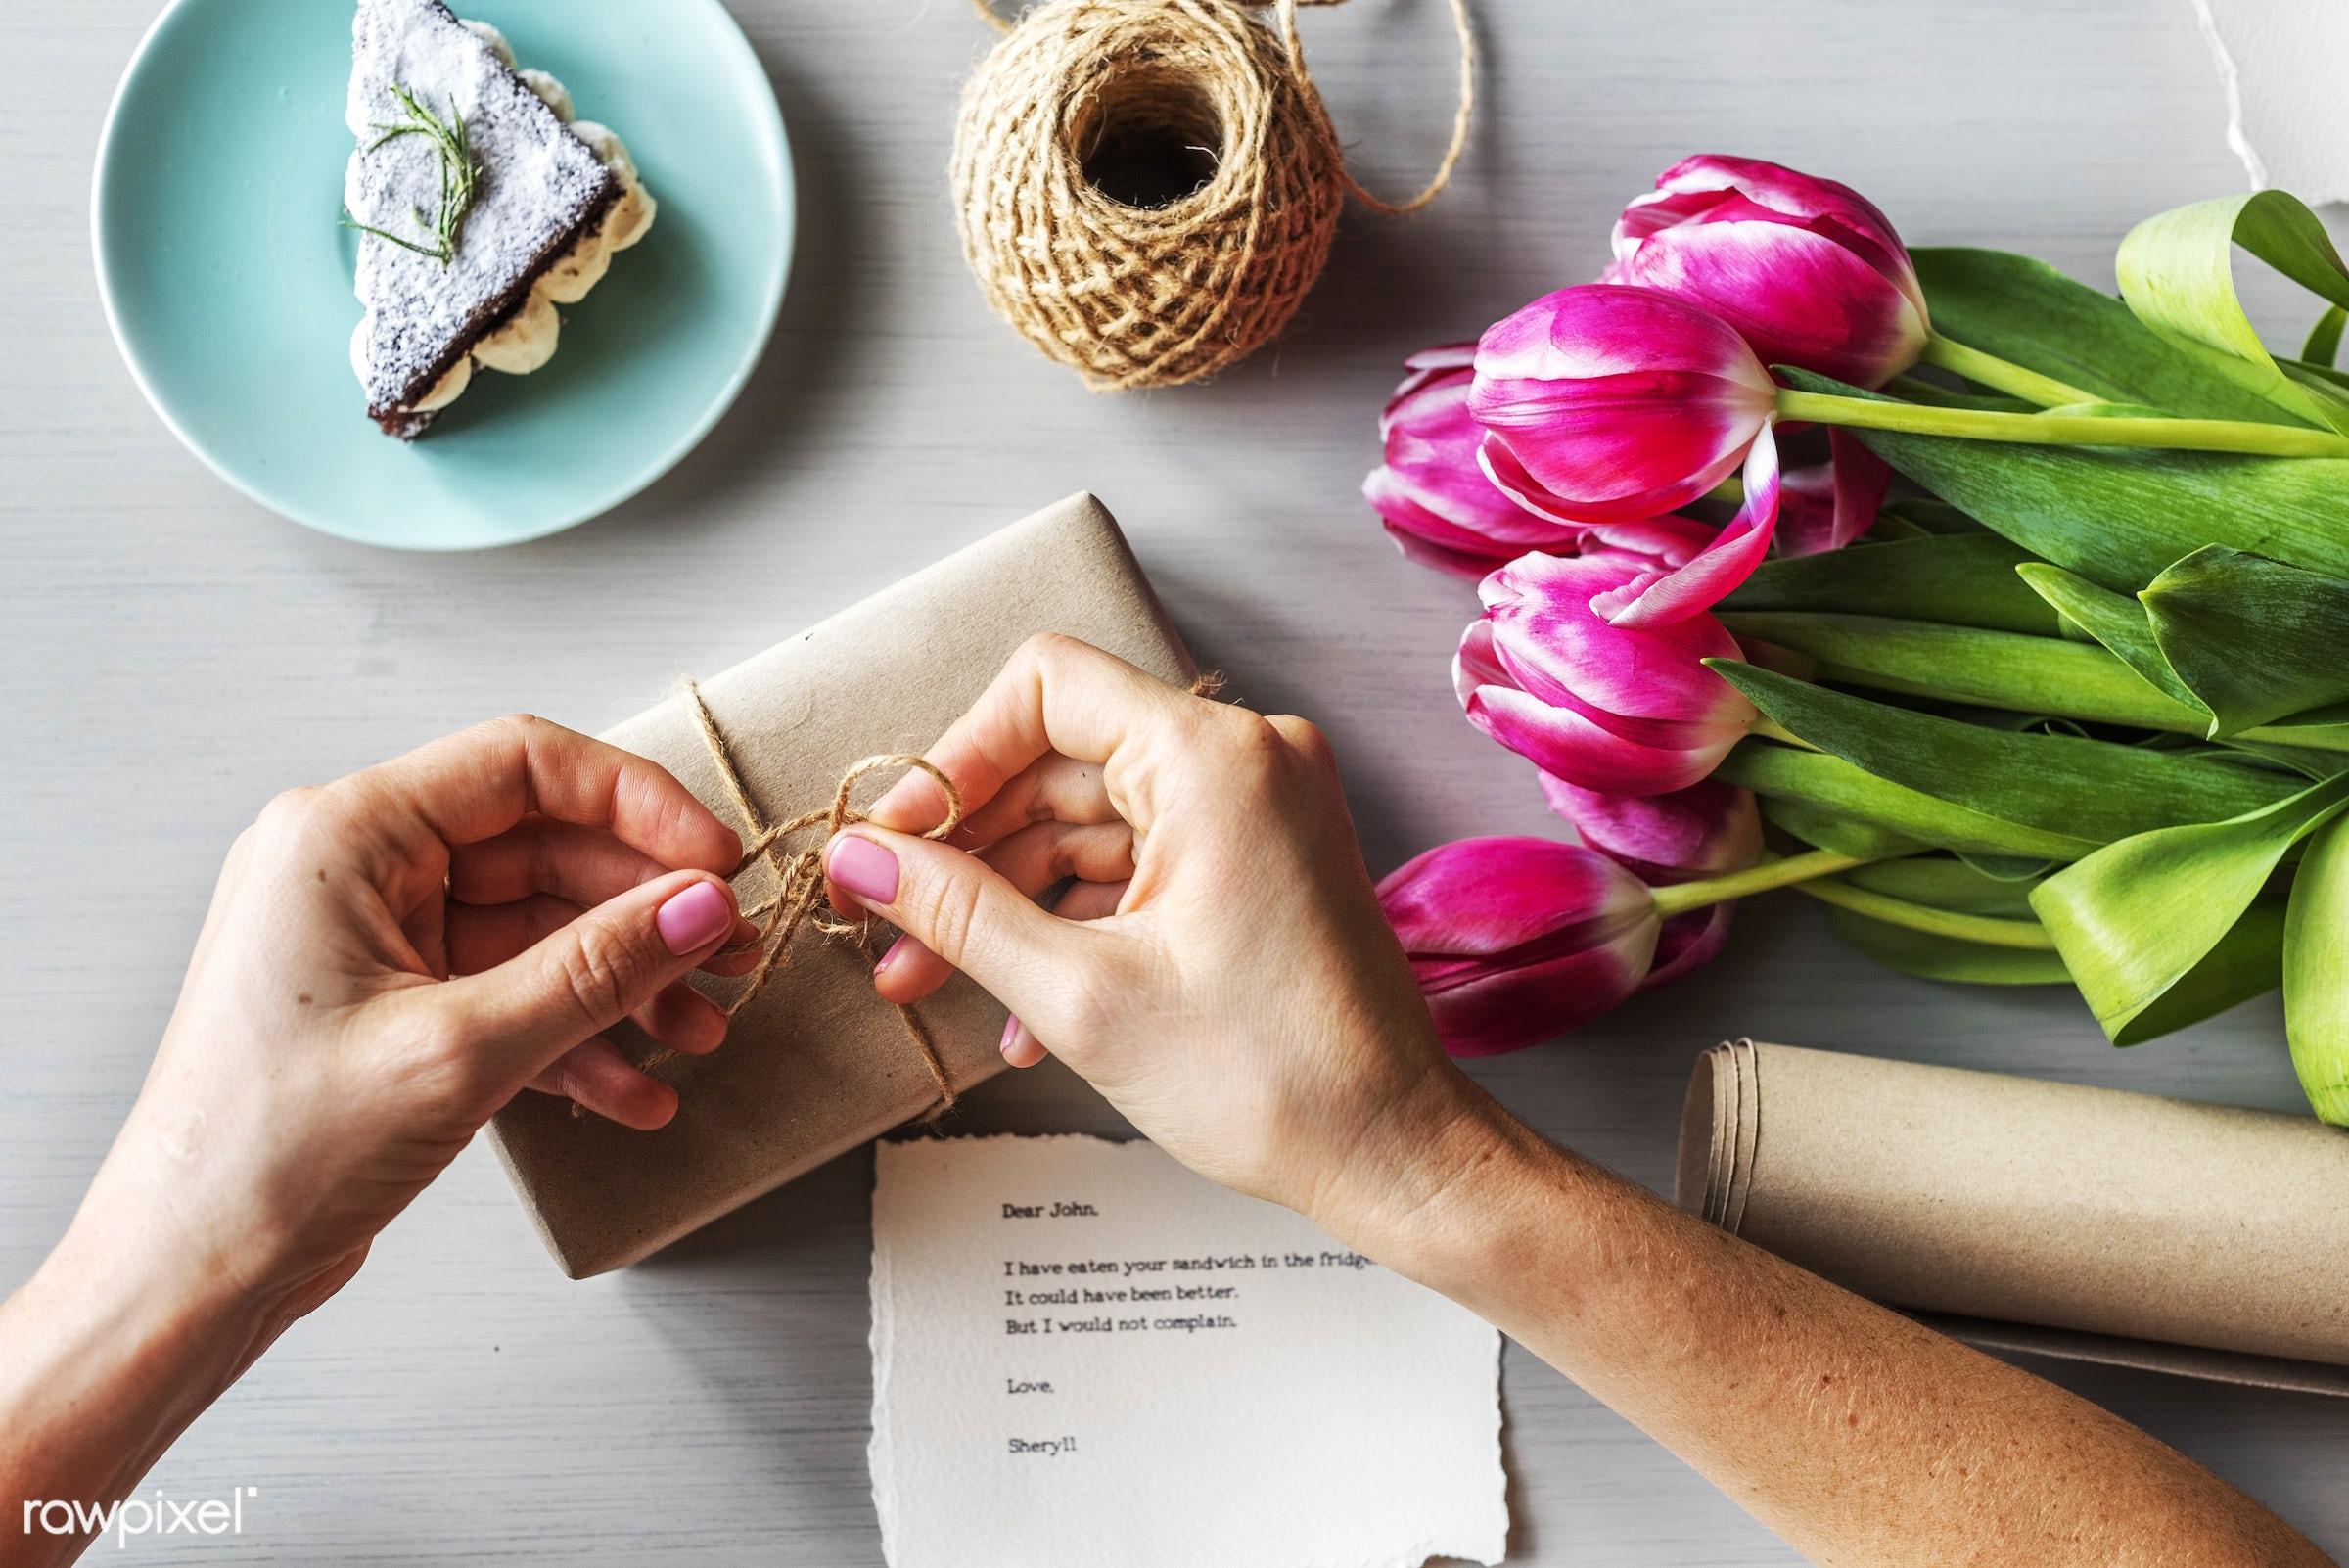 plant, bouquet, craft, decorative, botany, plants, romance, spring, blossom, nature, fresh, card, flower, cake, handcraft,...